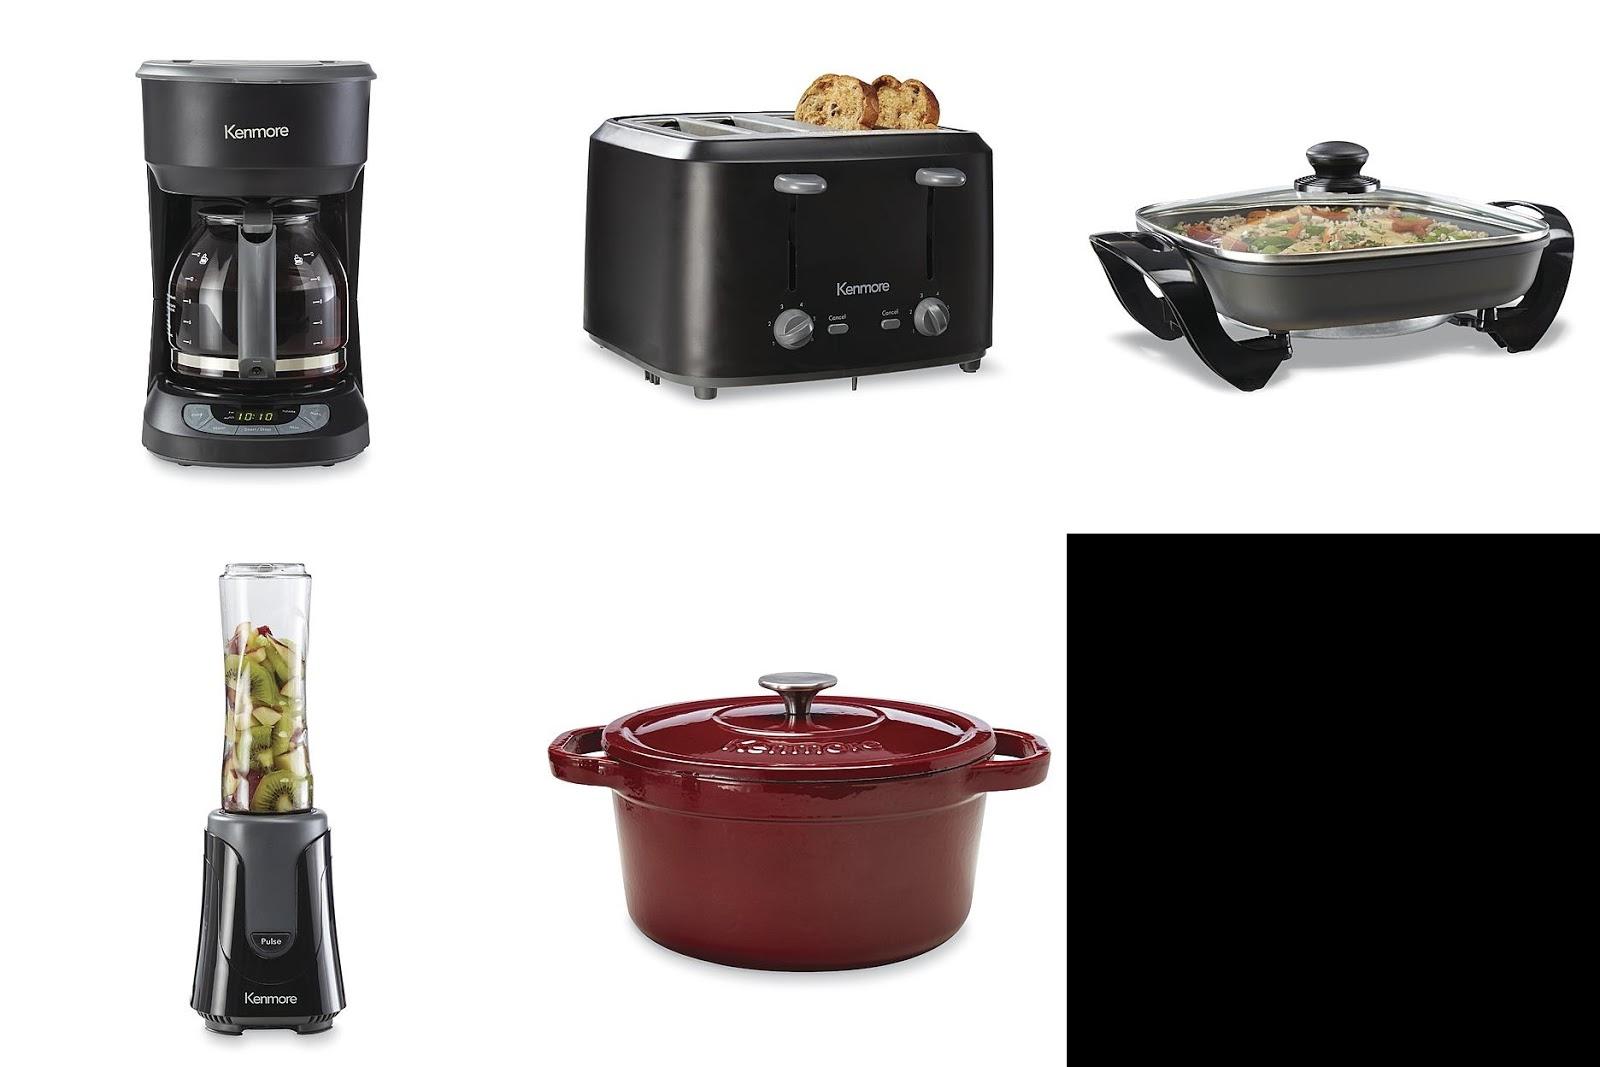 dead] sears: 100% back in points on select kenmore appliances